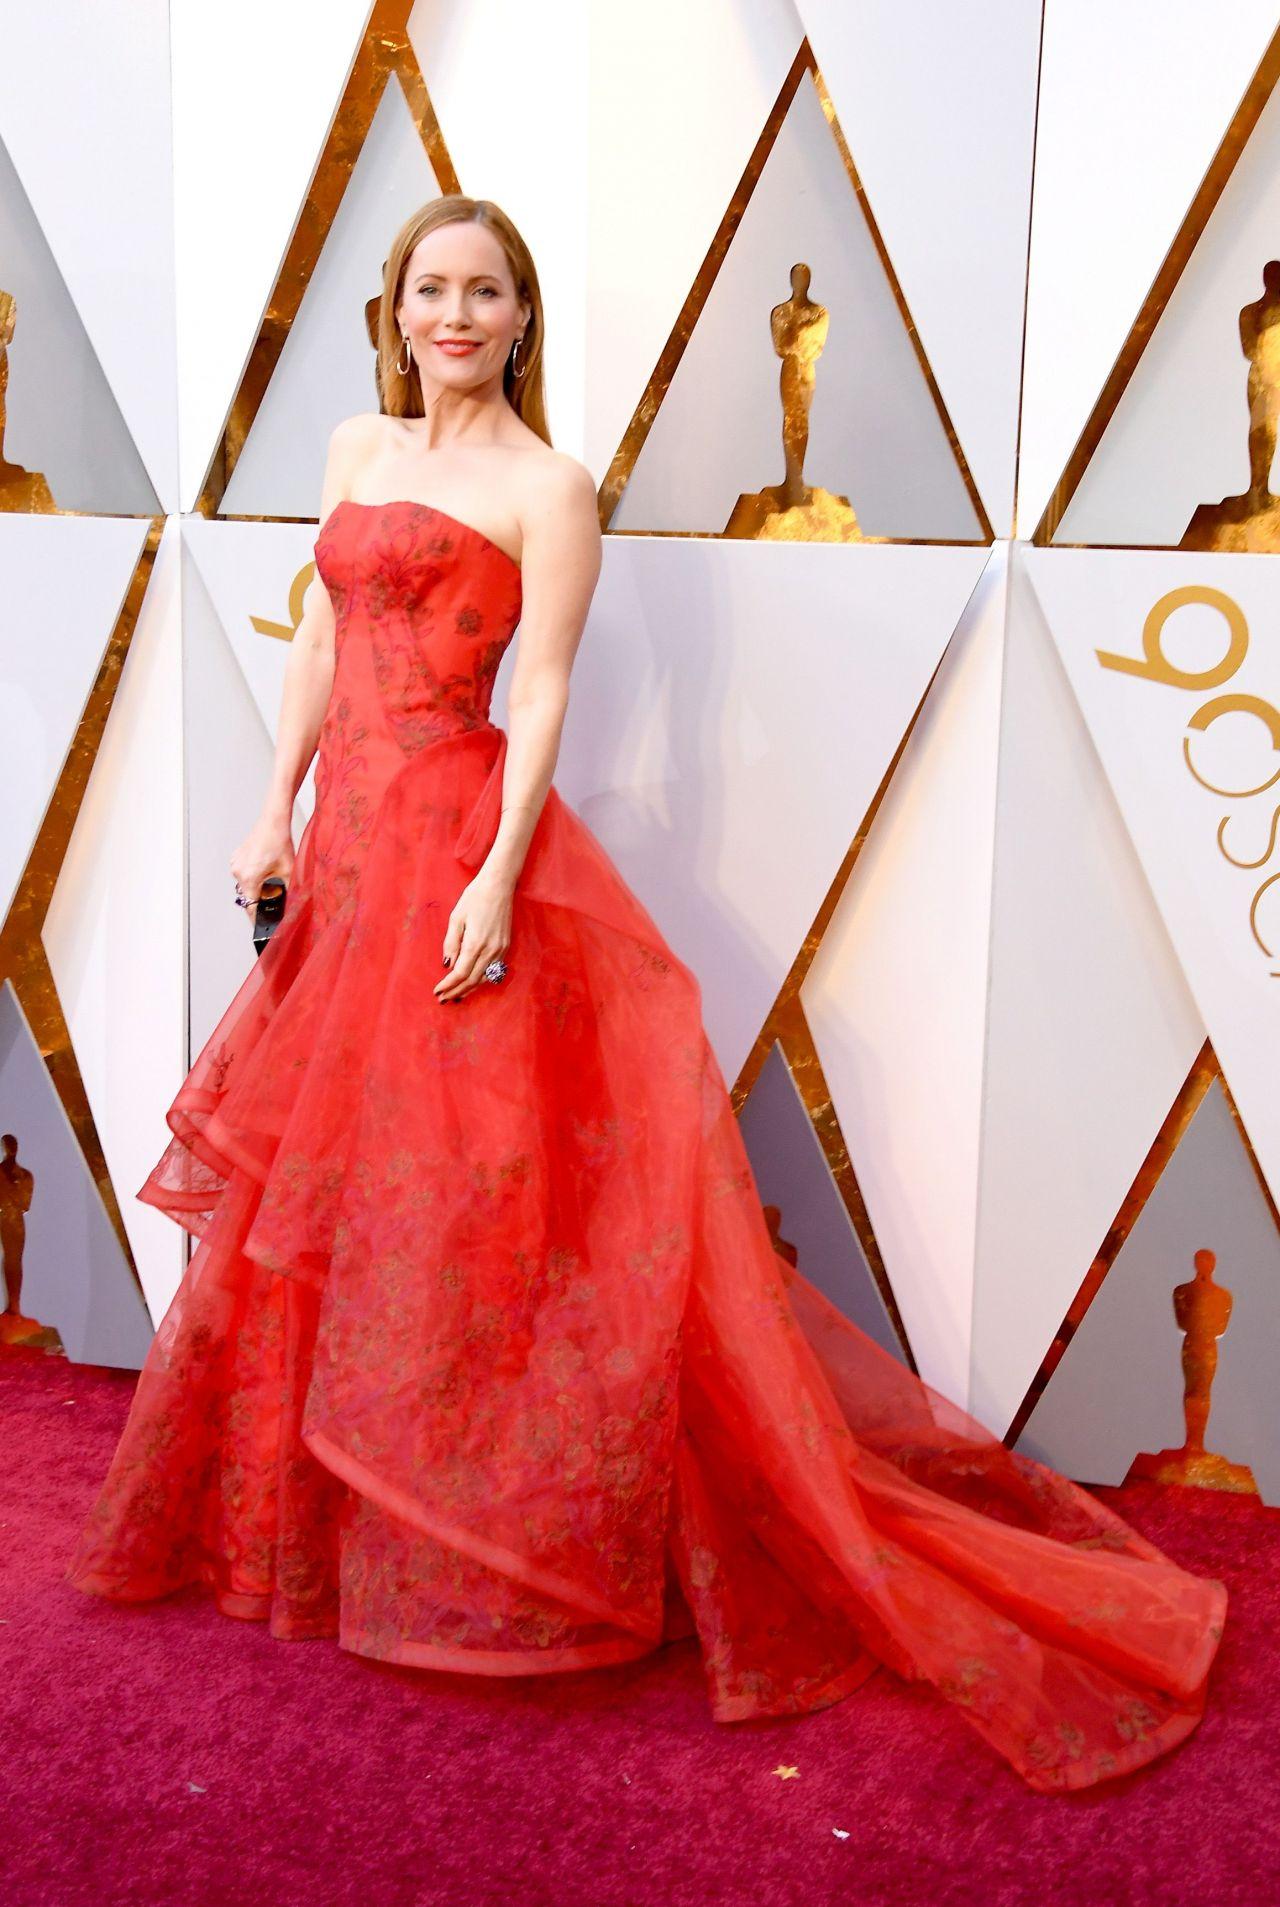 http://celebmafia.com/wp-content/uploads/2018/03/leslie-mann-oscars-2018-red-carpet-12.jpg